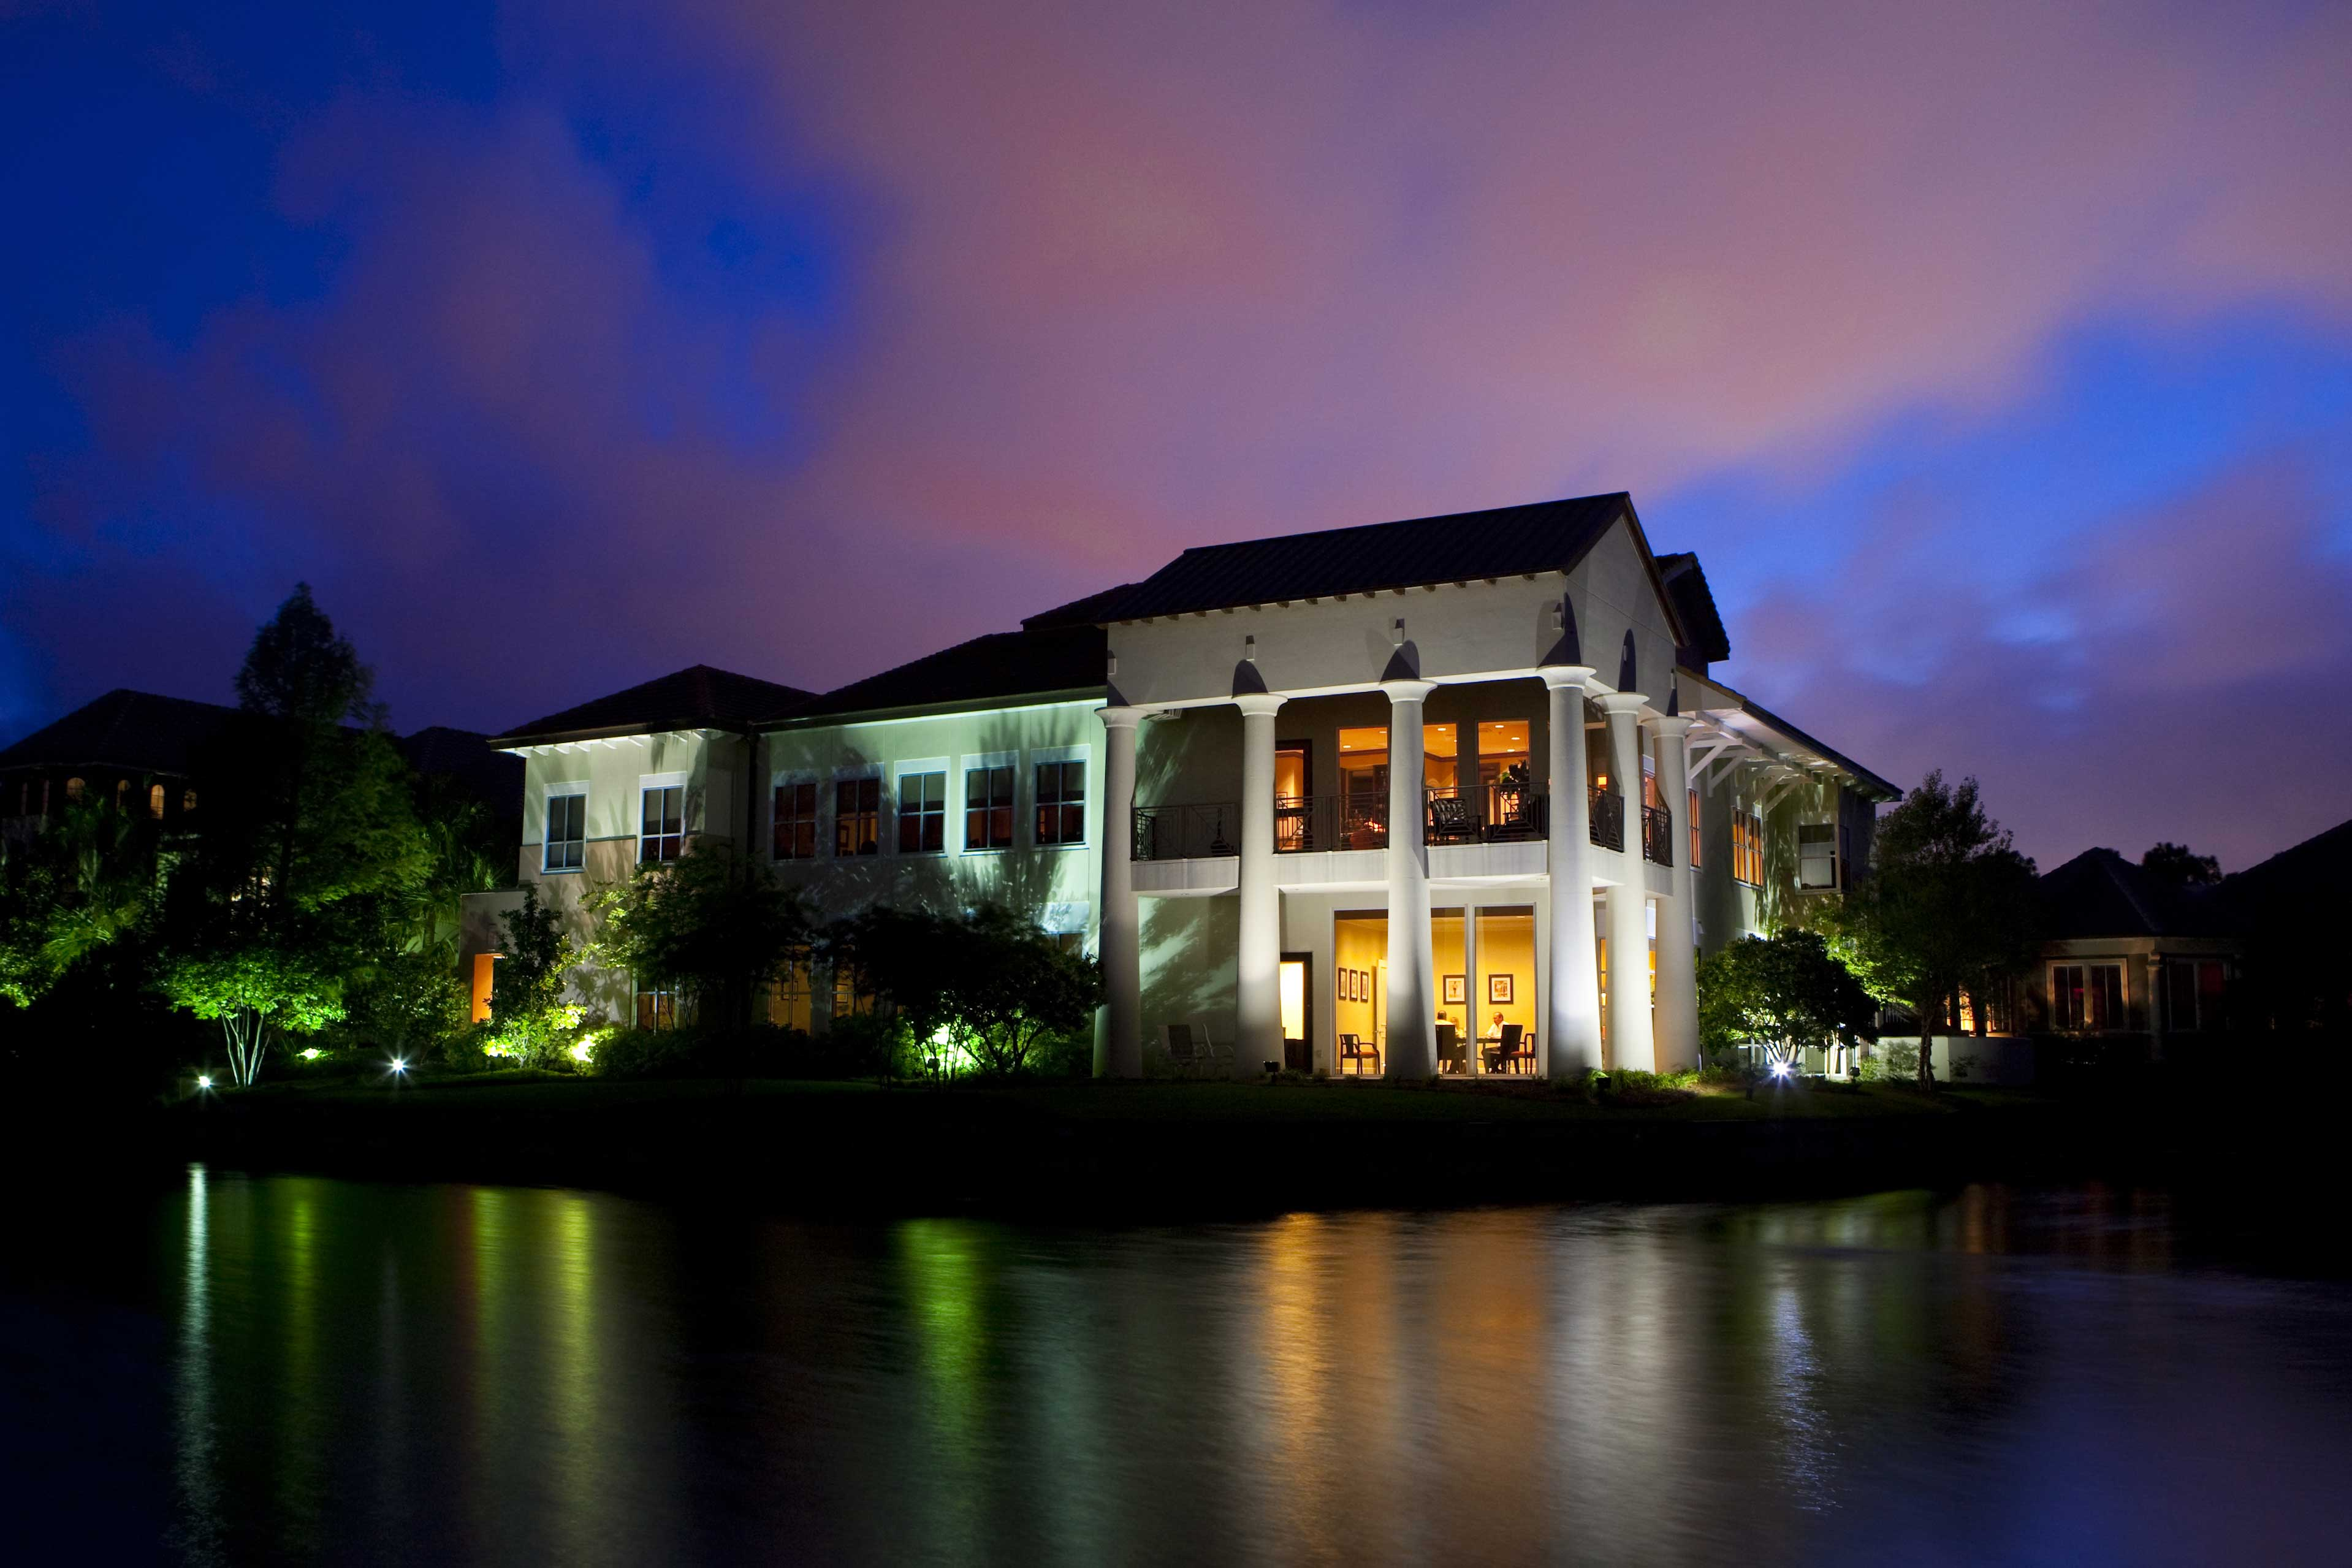 An exterior night photograph of the Matthews & Jones law office in Destin, Florida.